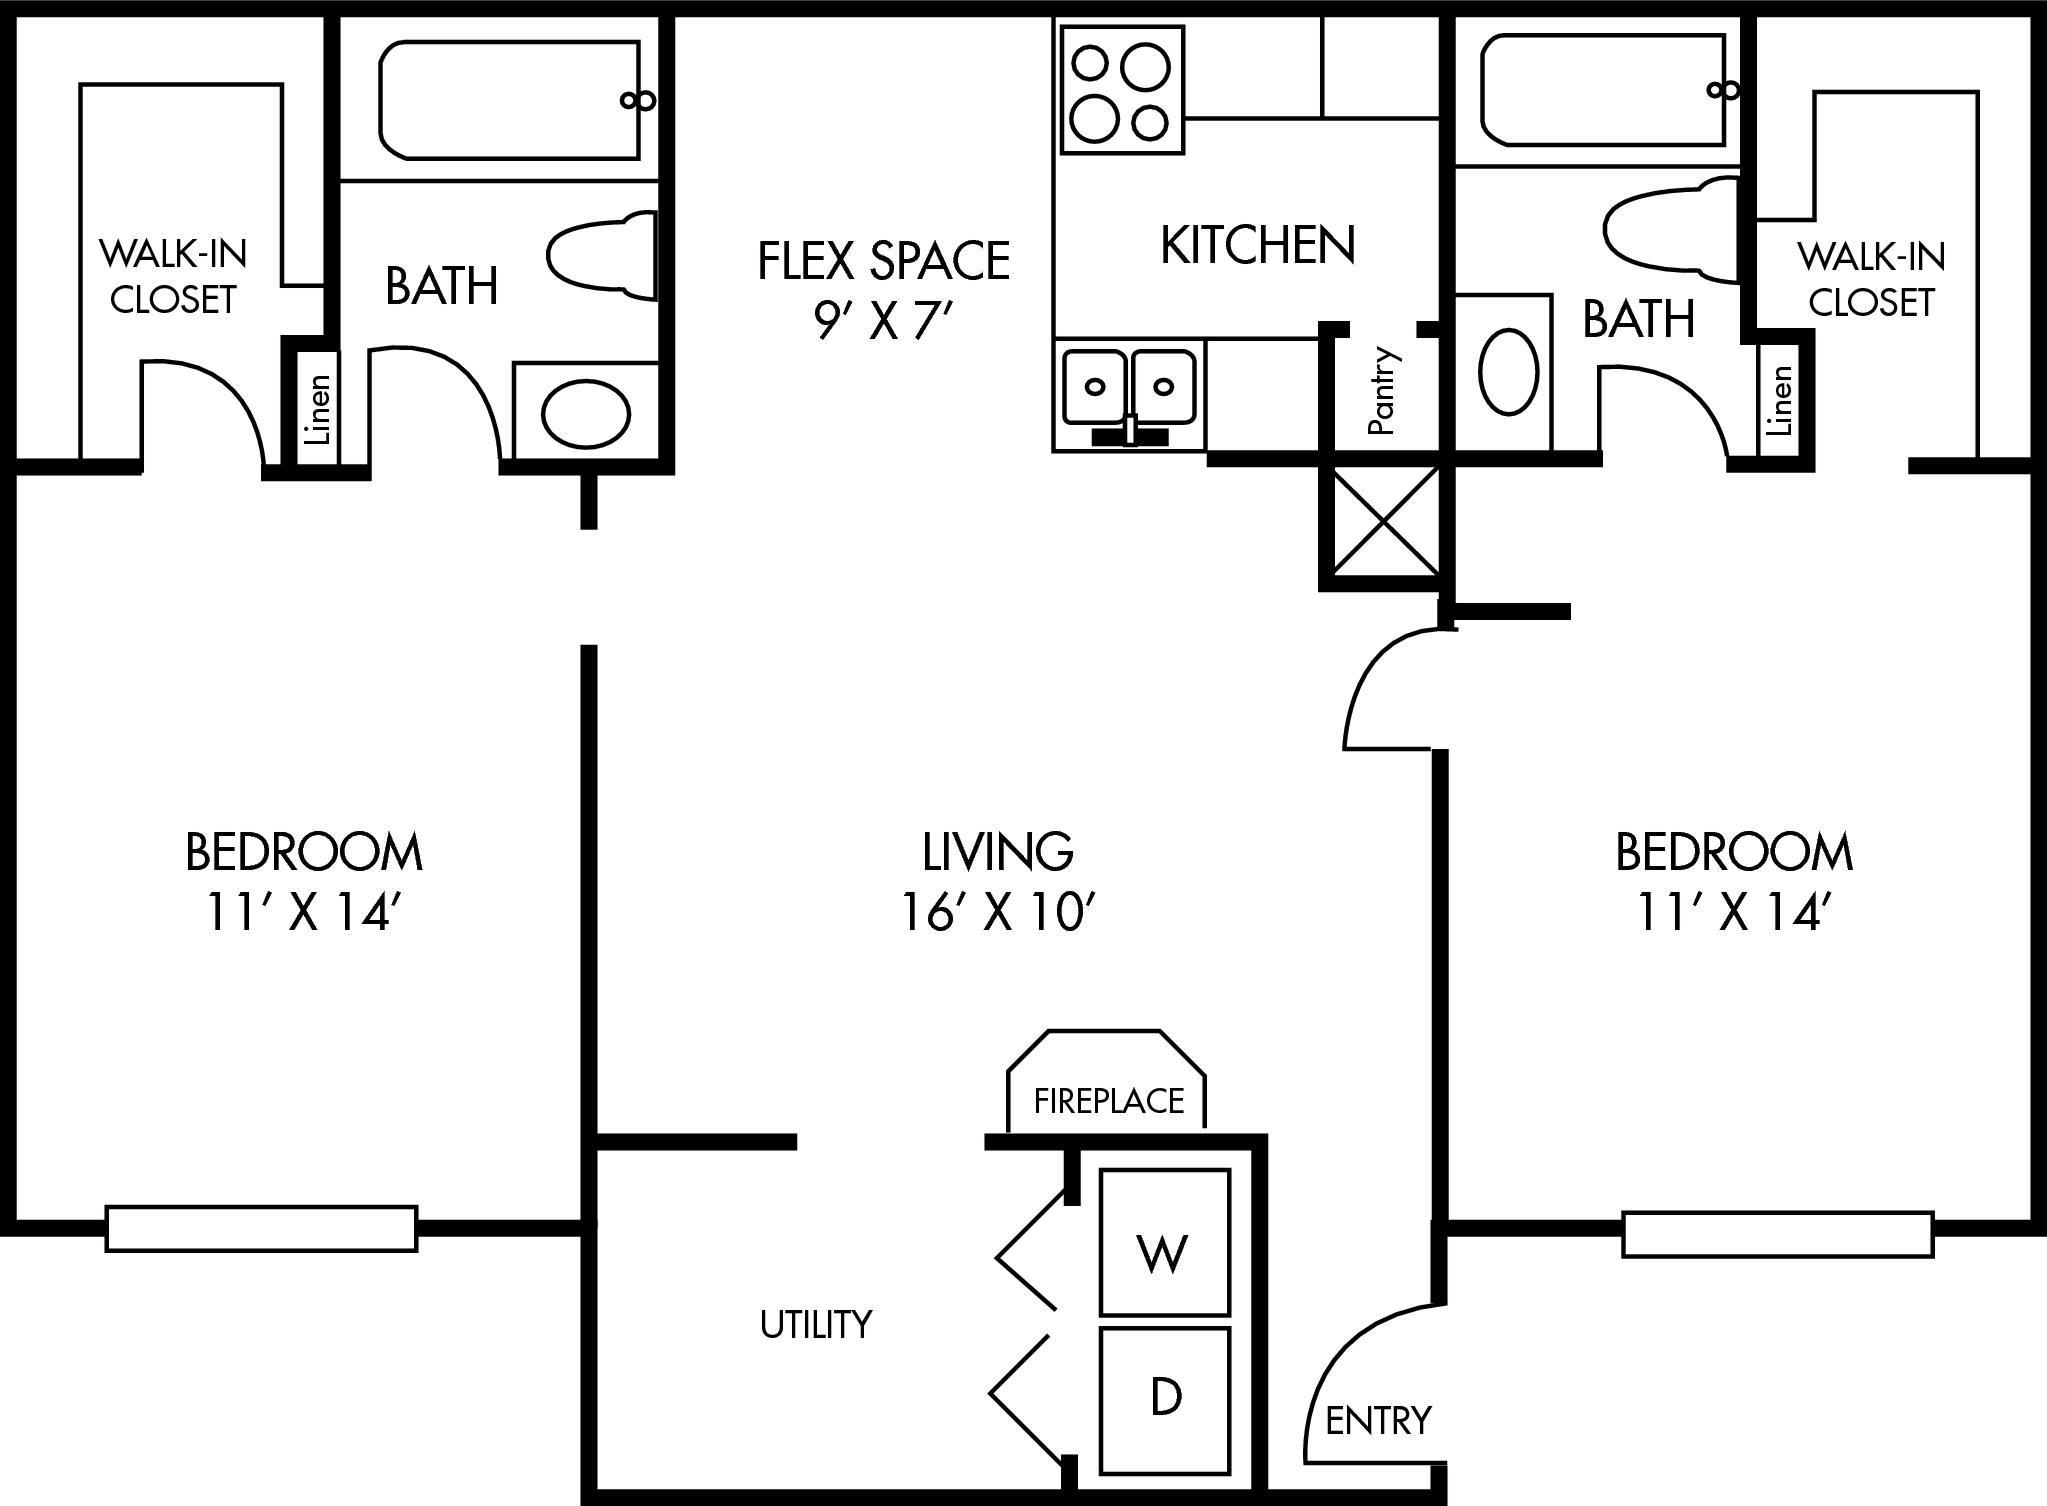 Breckenridge at Cityview 2 bed 2 bath Floor Plan 933 square feet